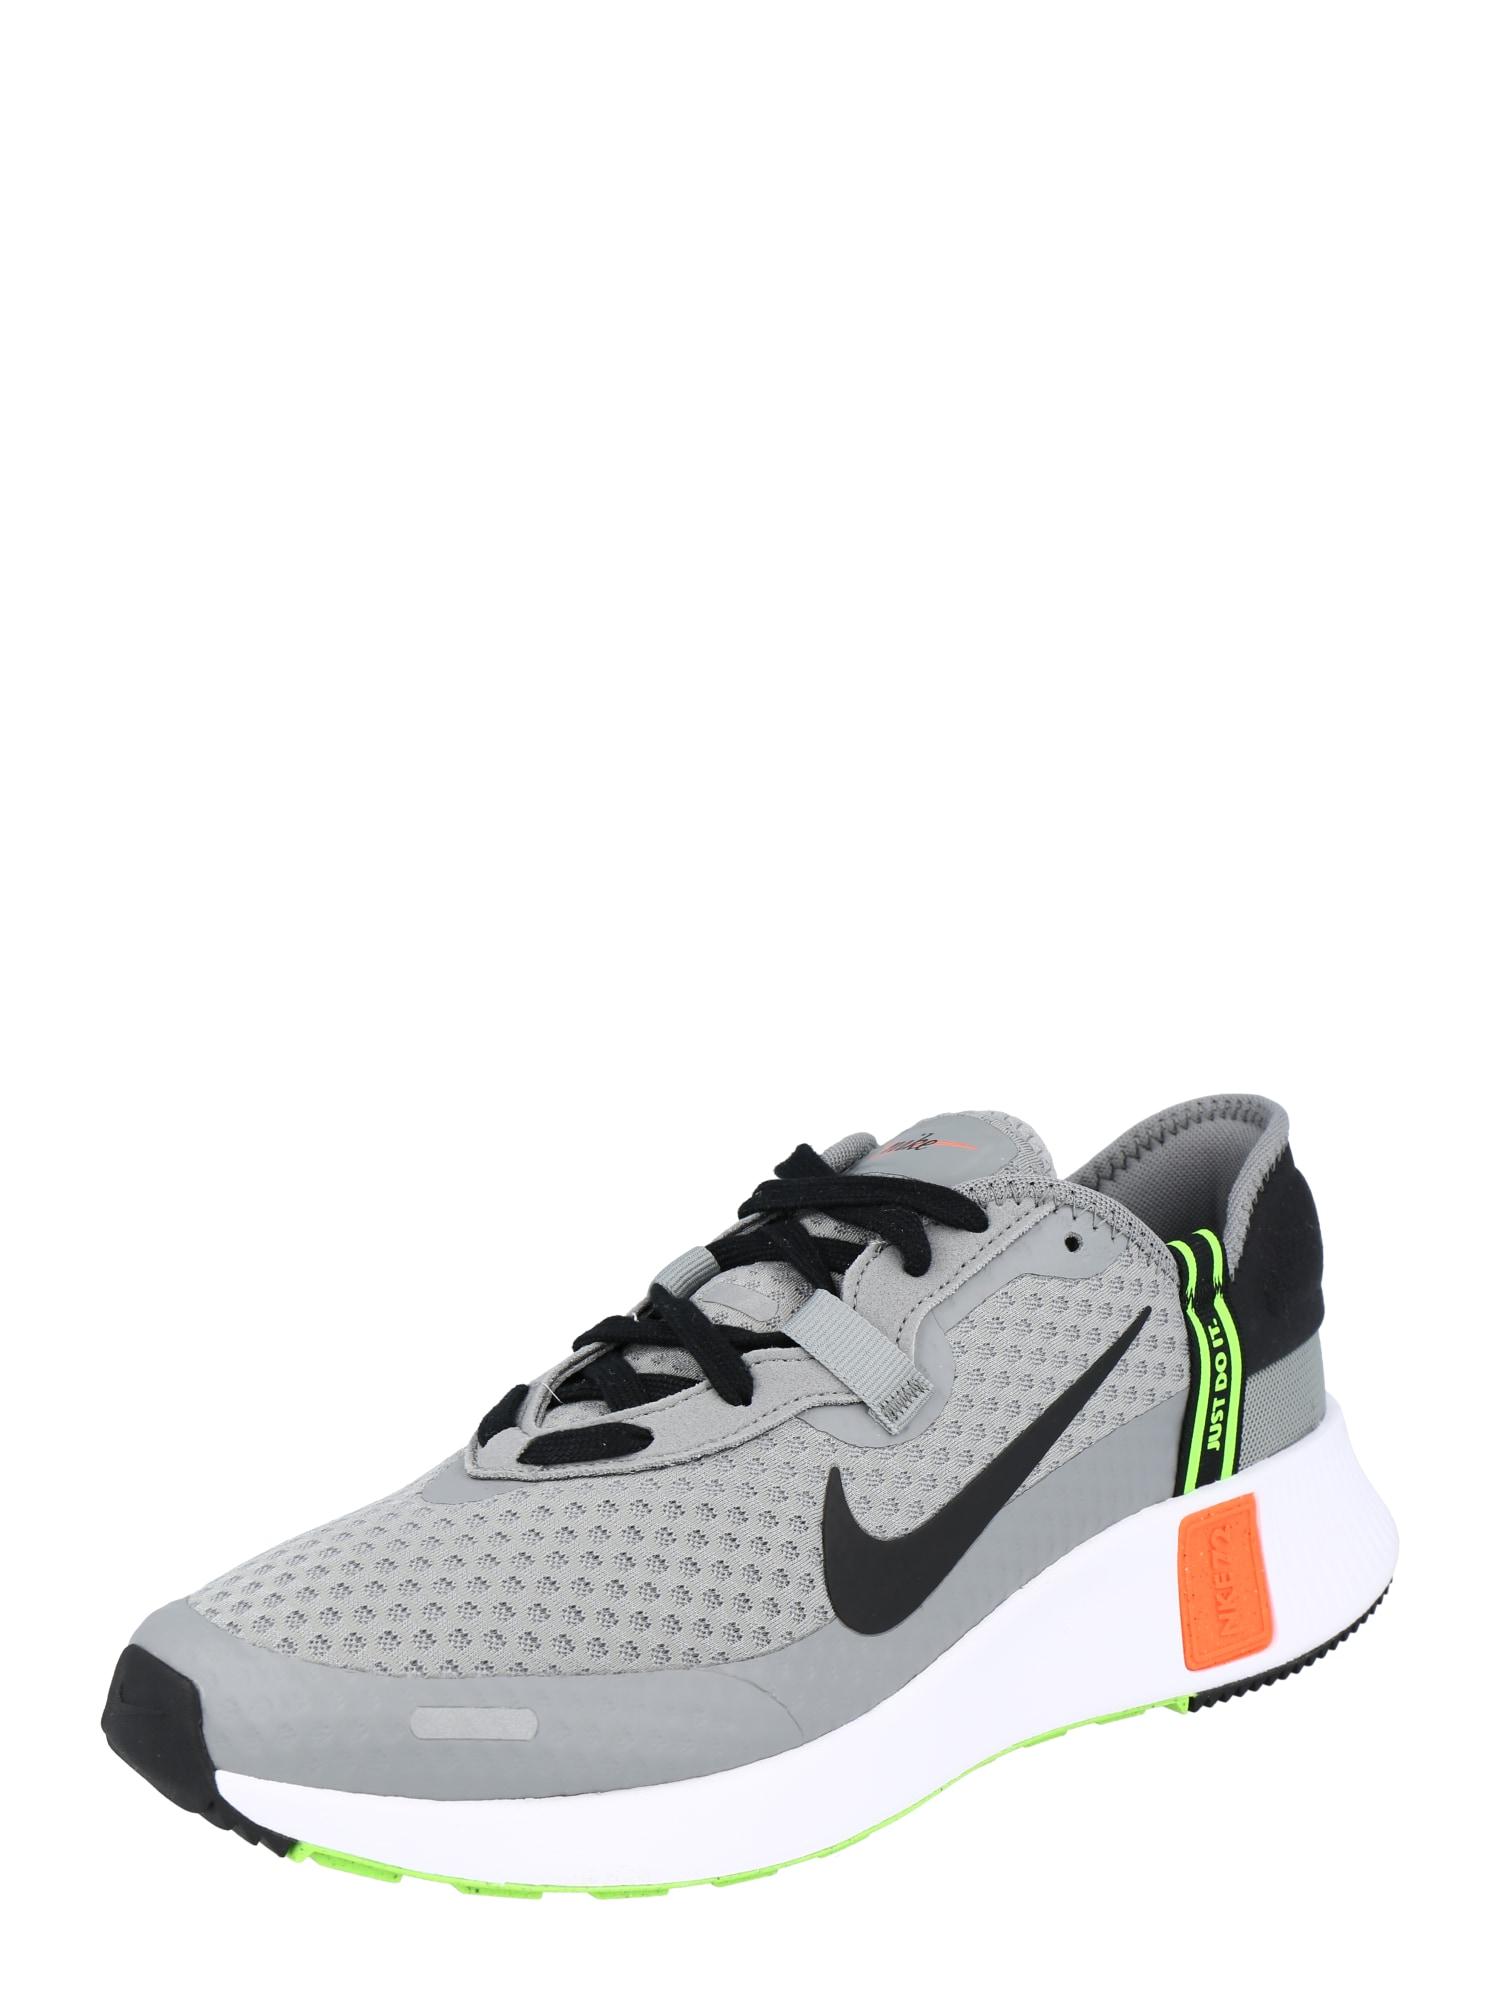 Nike Sportswear Nízke tenisky 'Reposto'  sivá / čierna / neónovo zelená / oranžová